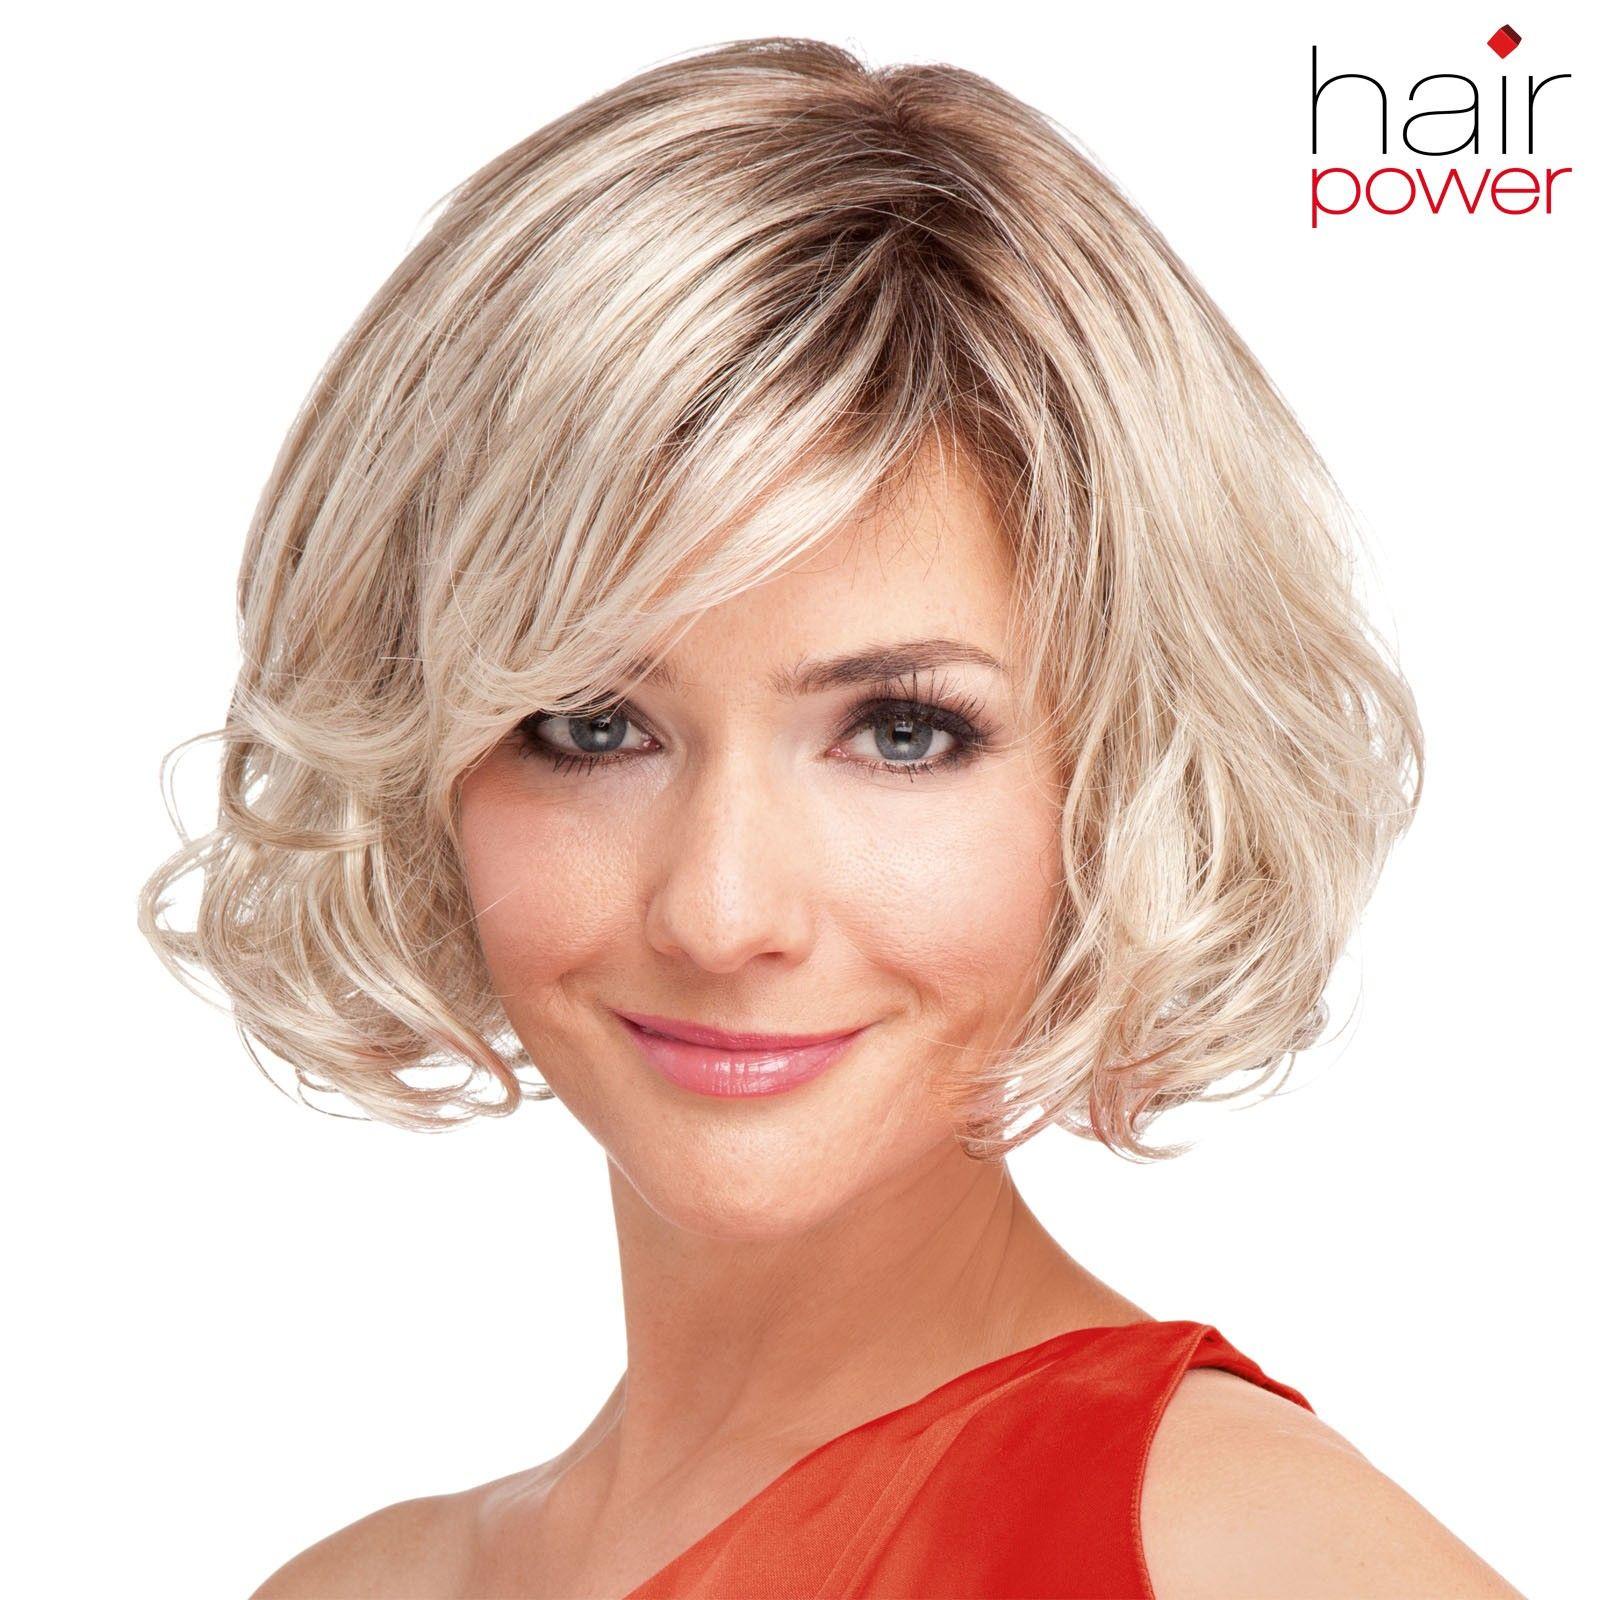 Perfekte frisuren kinnlang 10  Frisuren 10  Perfekte frisur